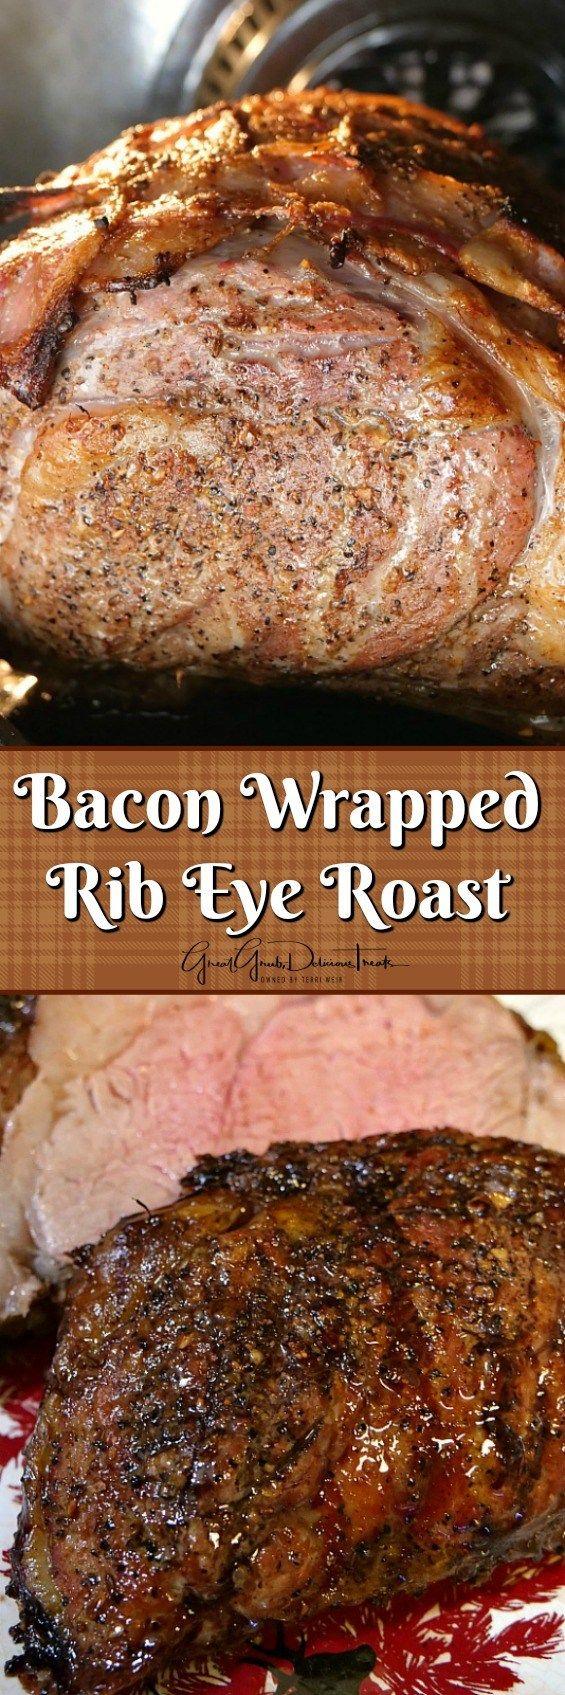 Bacon Wrapped Rib Eye Roast